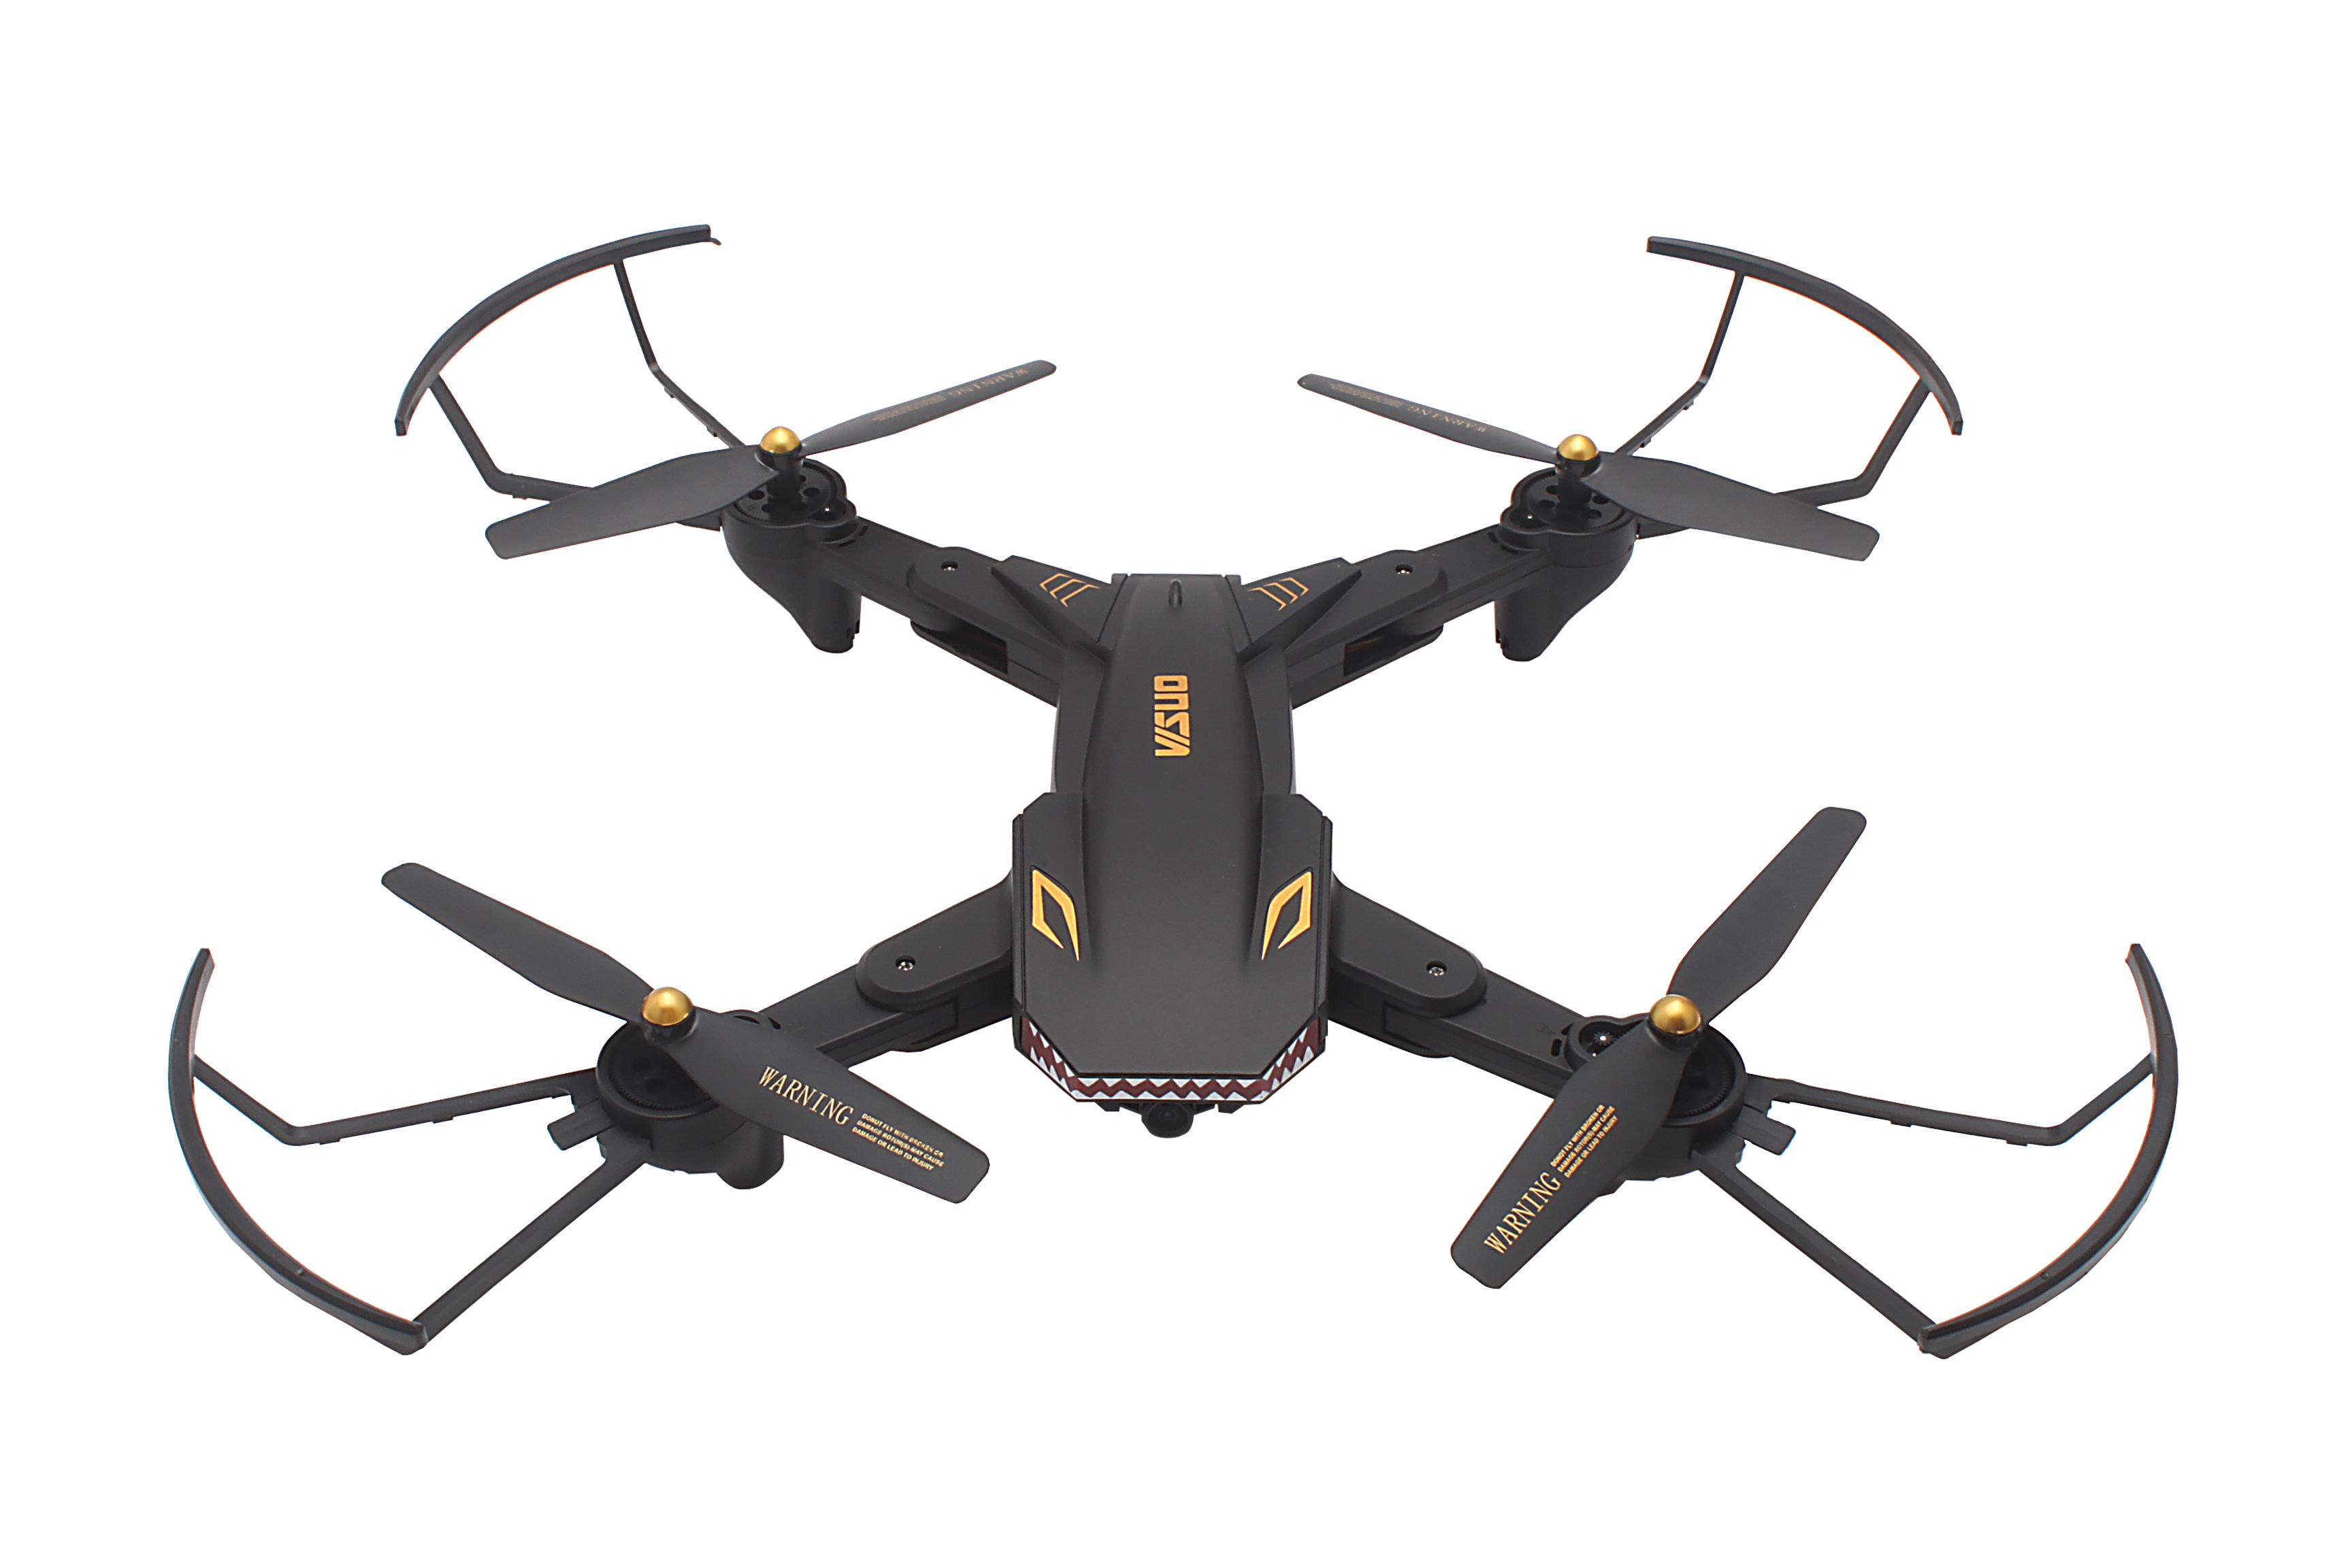 images/bulk-wholesale/TIANQU-VISUO-XS809S-Drone-Foldable-Design-6-Axis-Gyro-20-Min-Flight-Time-App-Support-FPV-HD-Video-50m-Range-plusbuyer.jpg